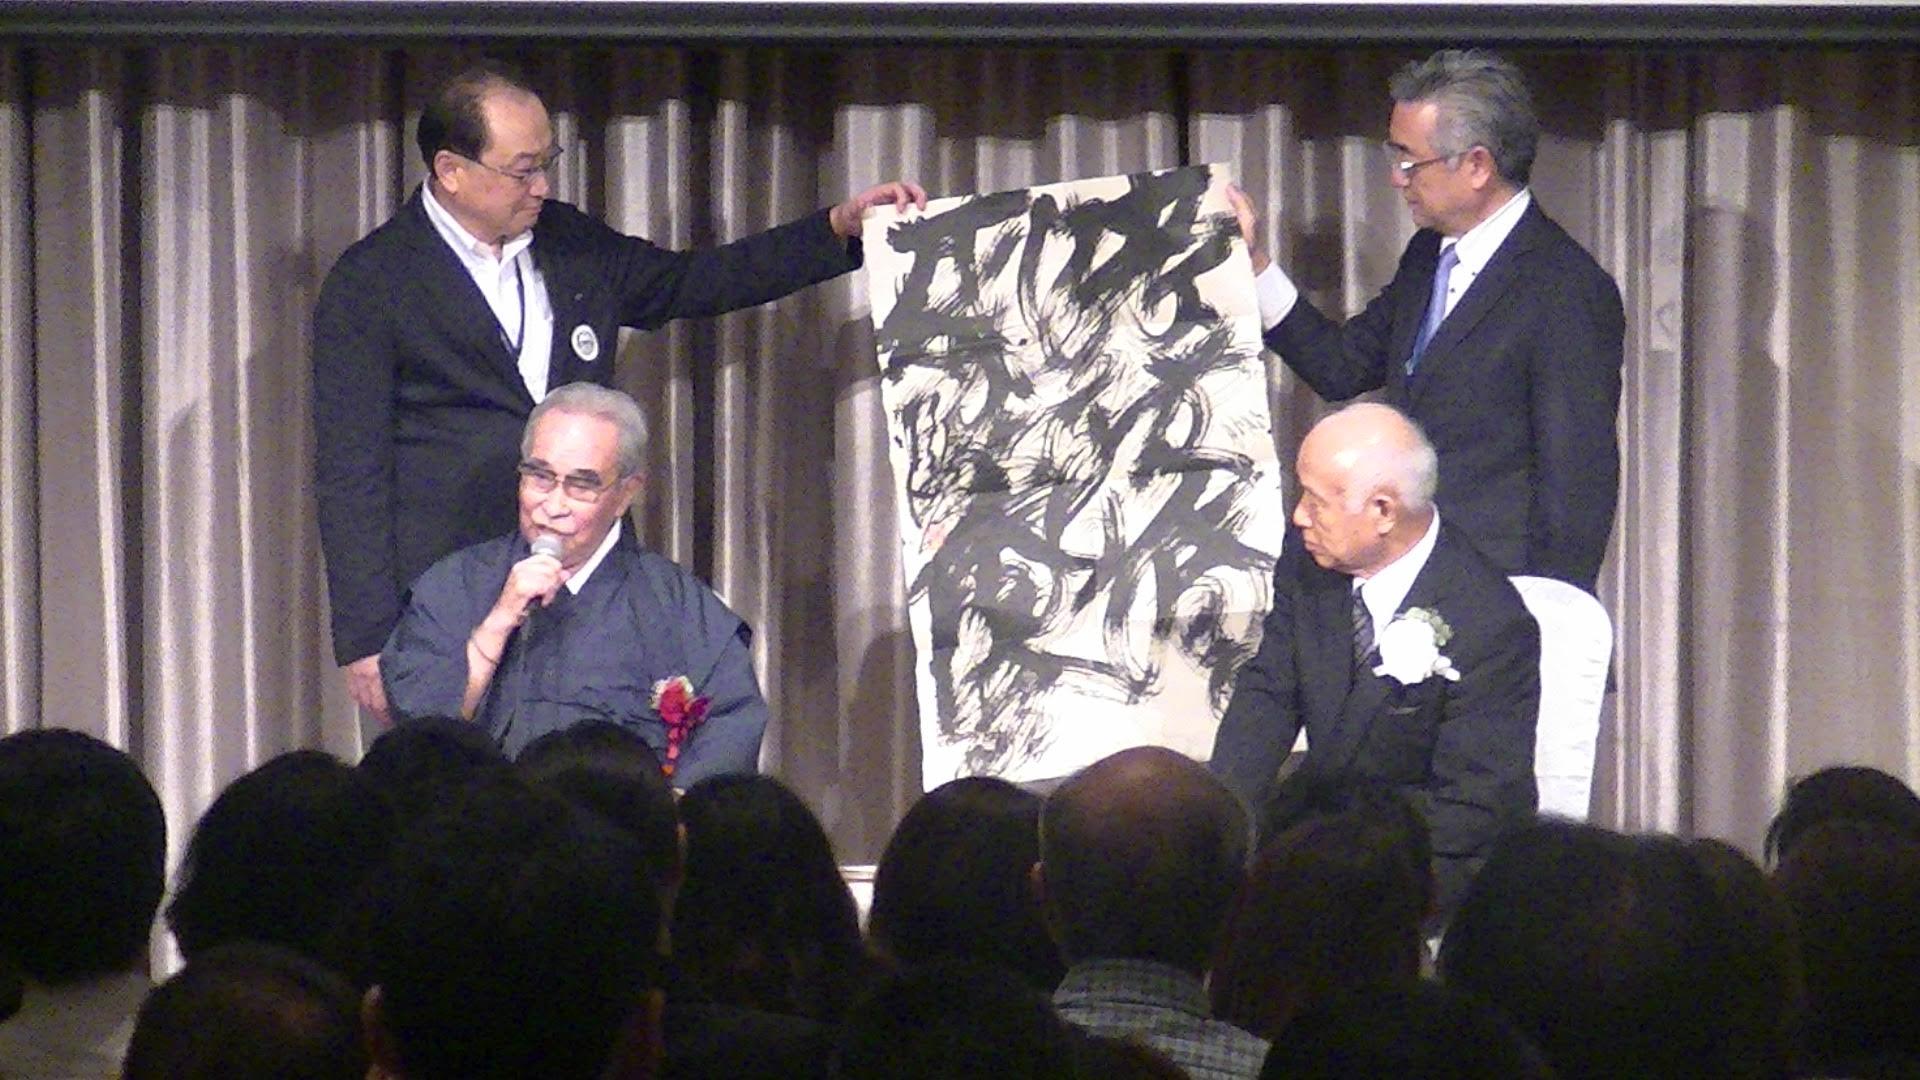 PIC 1809 1 - 思風会全国大会in広島